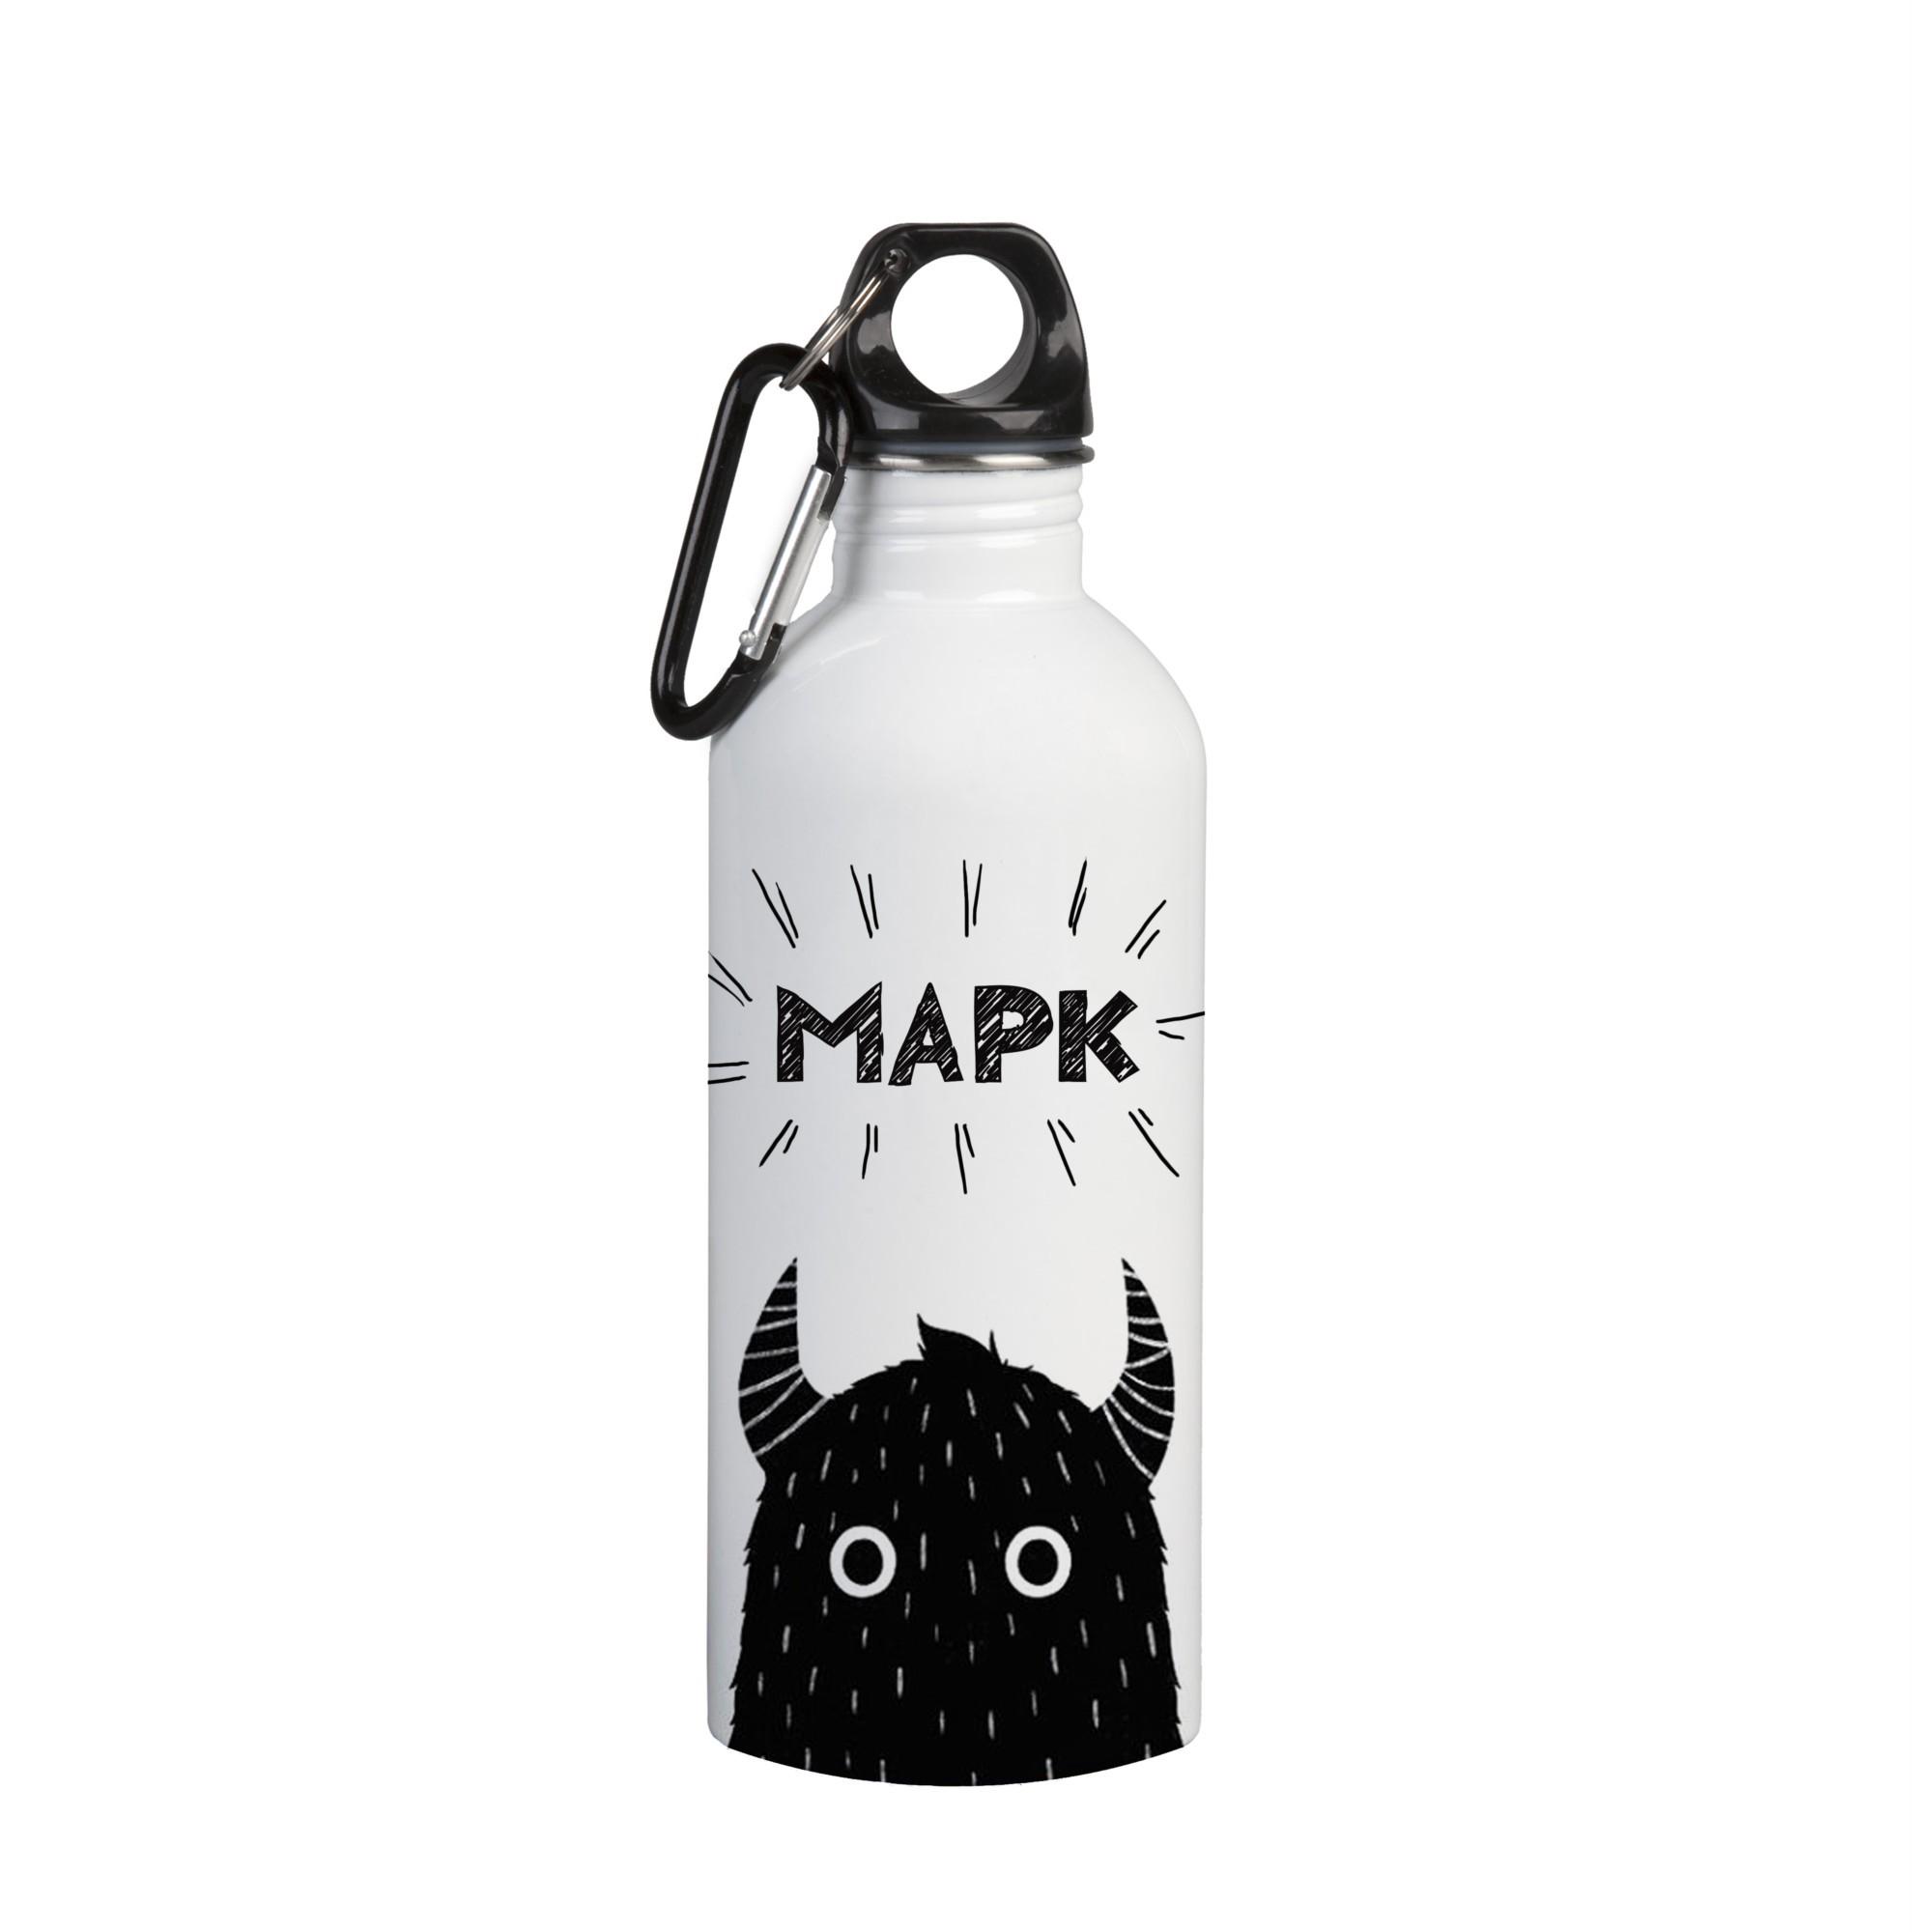 Именная бутылка для воды Марк